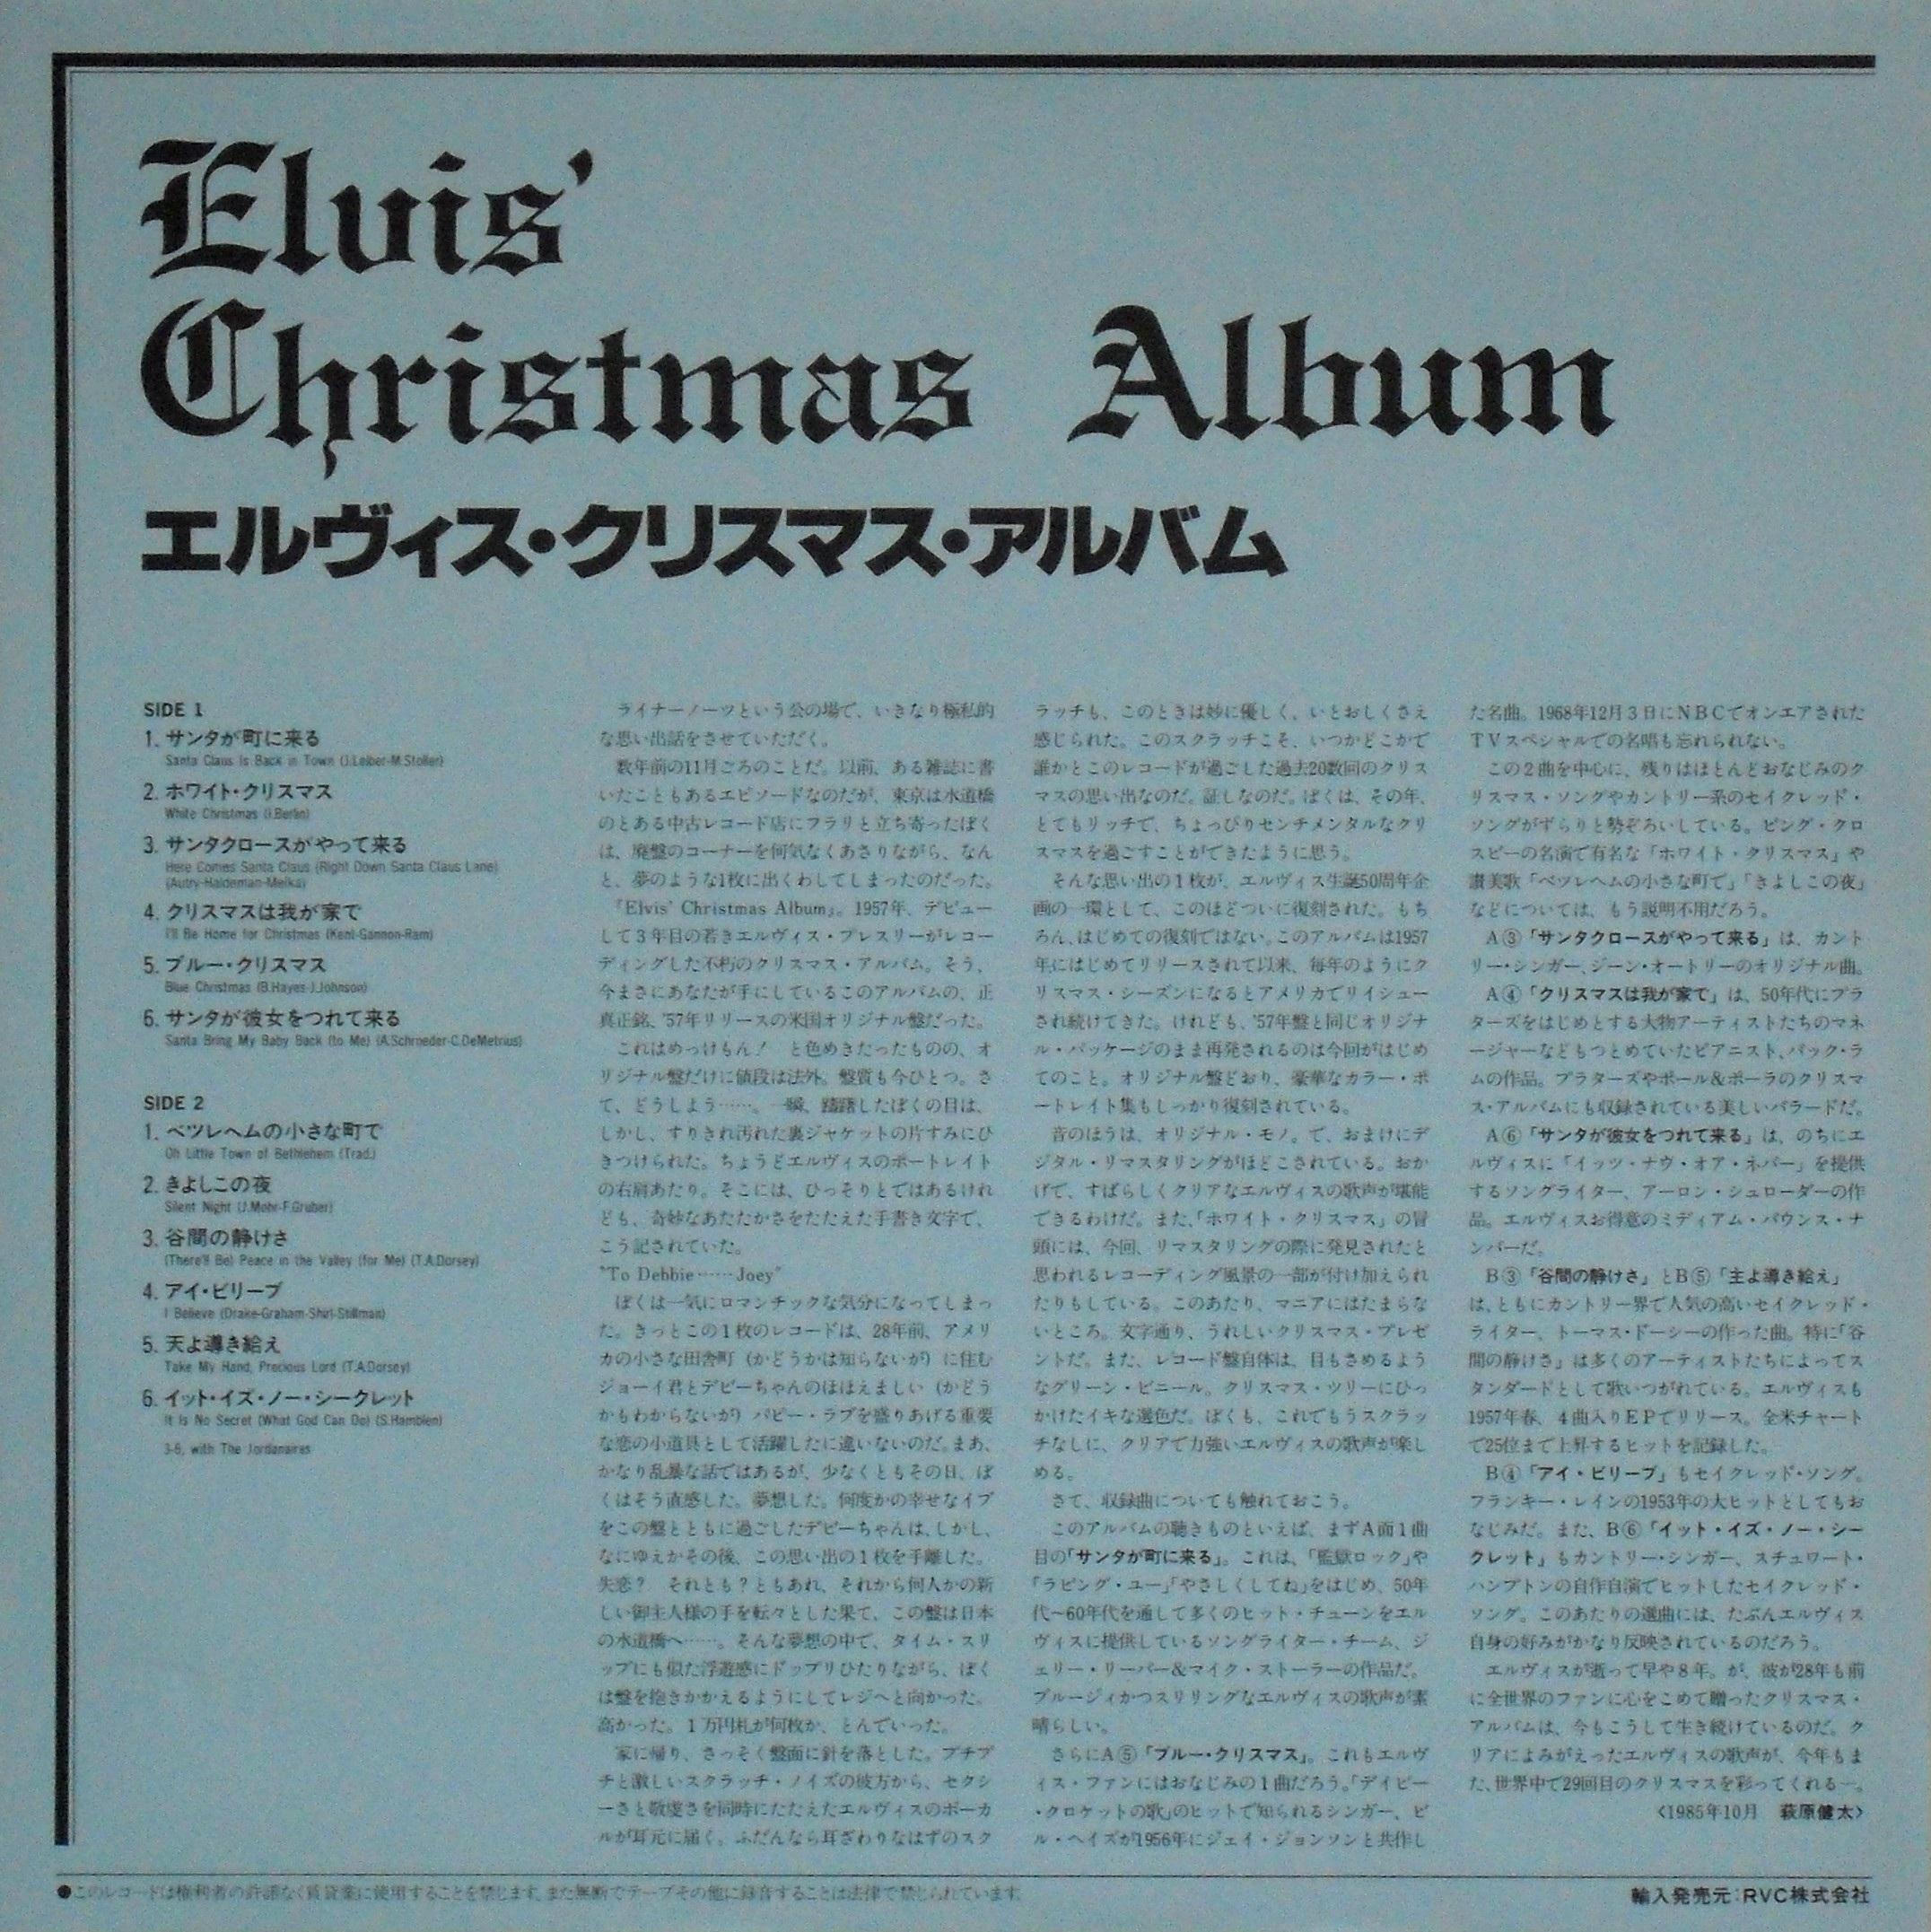 ELVIS' CHRISTMAS ALBUM 03gijpa